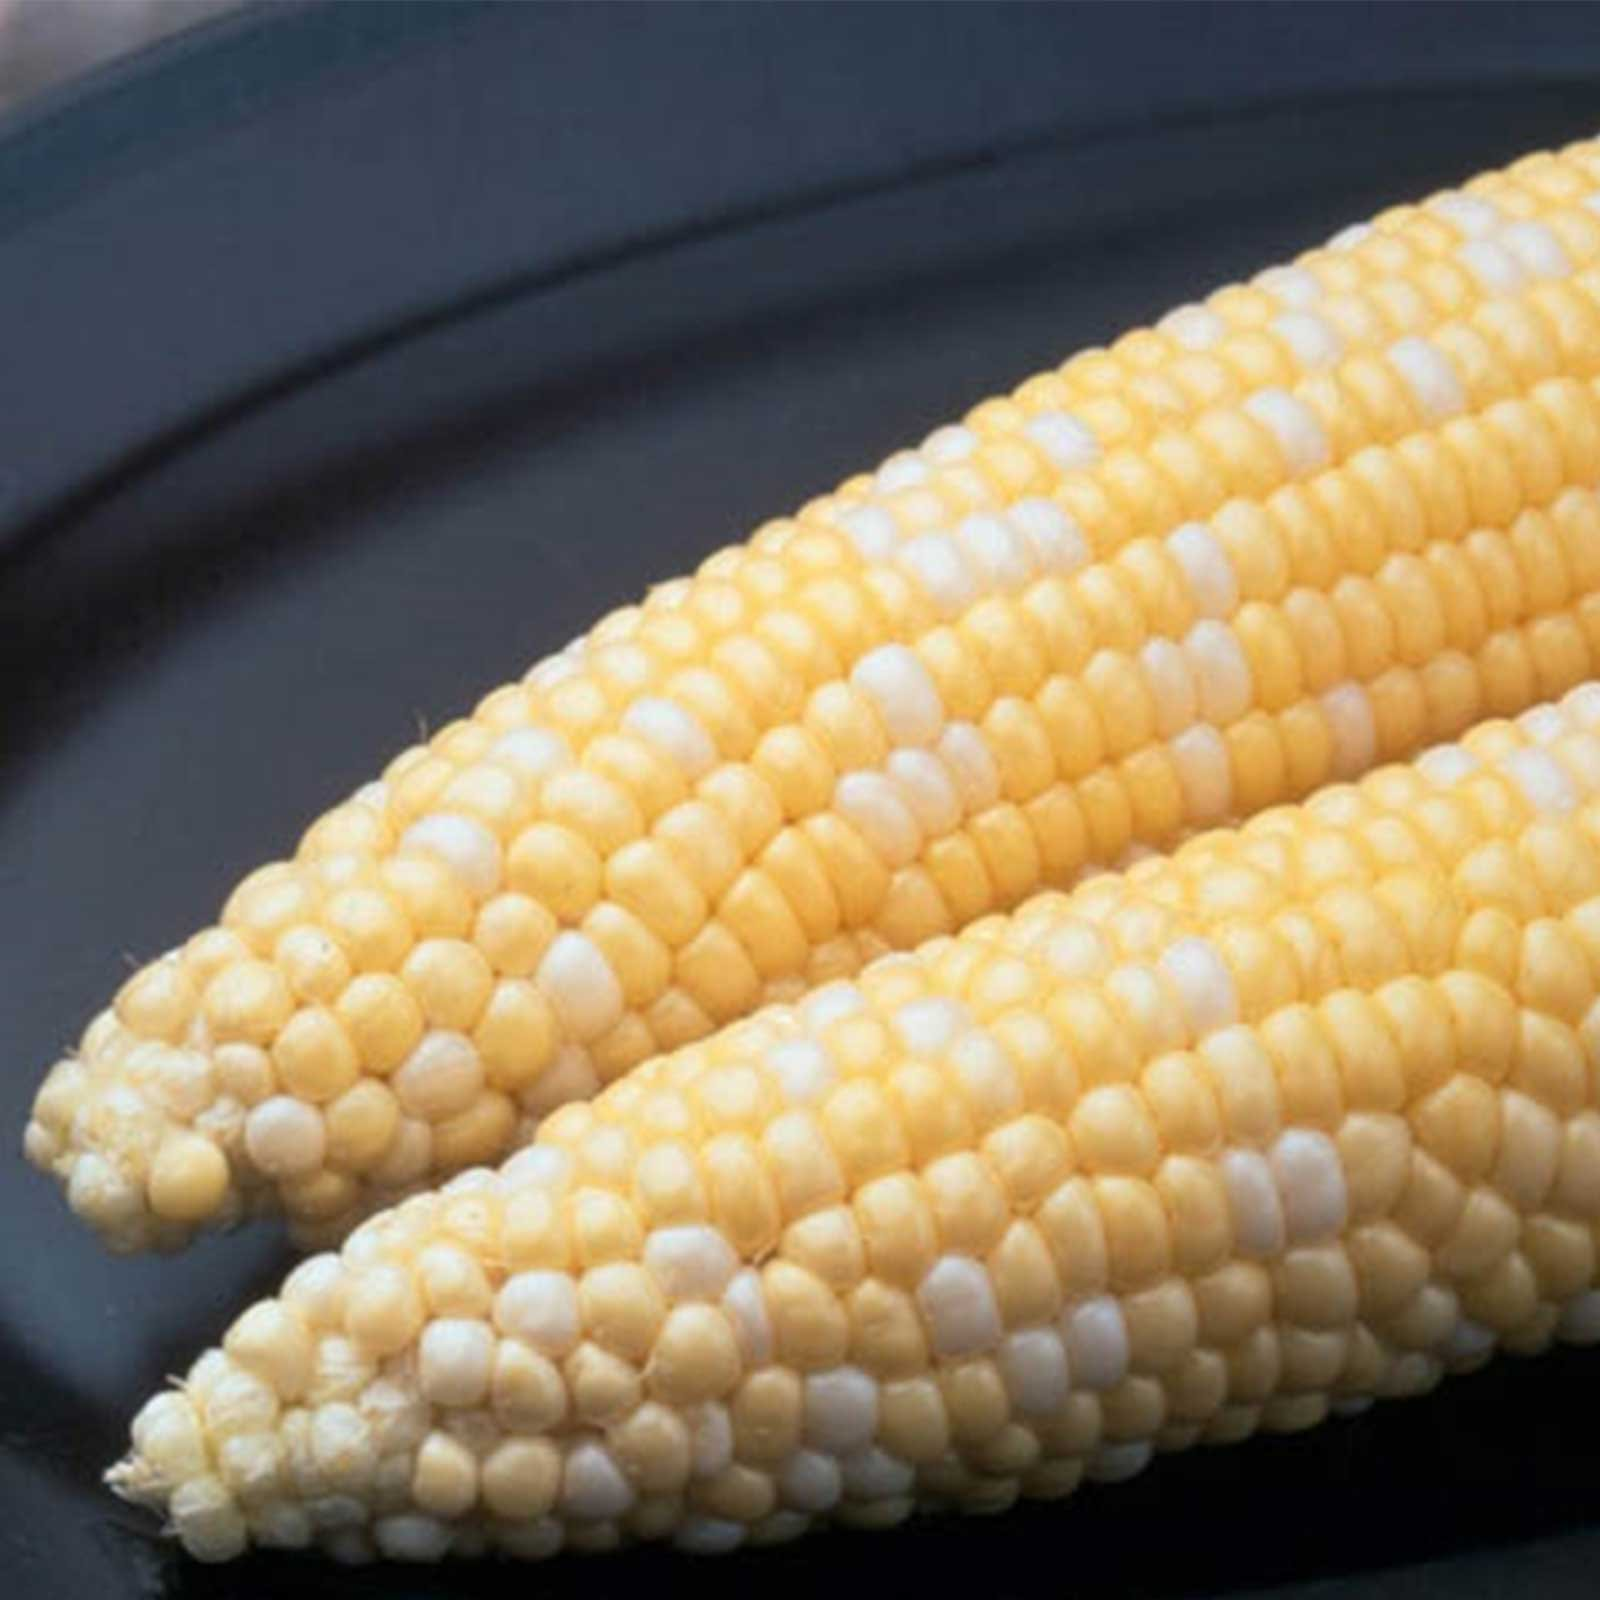 Ambrosia Hybrid Corn Garden Seeds - 5 Lbs - Non-GMO, Bi-Color SE Vegetable Gardening Seeds & Micro Corn Shoots by Mountain Valley Seed Company (Image #1)